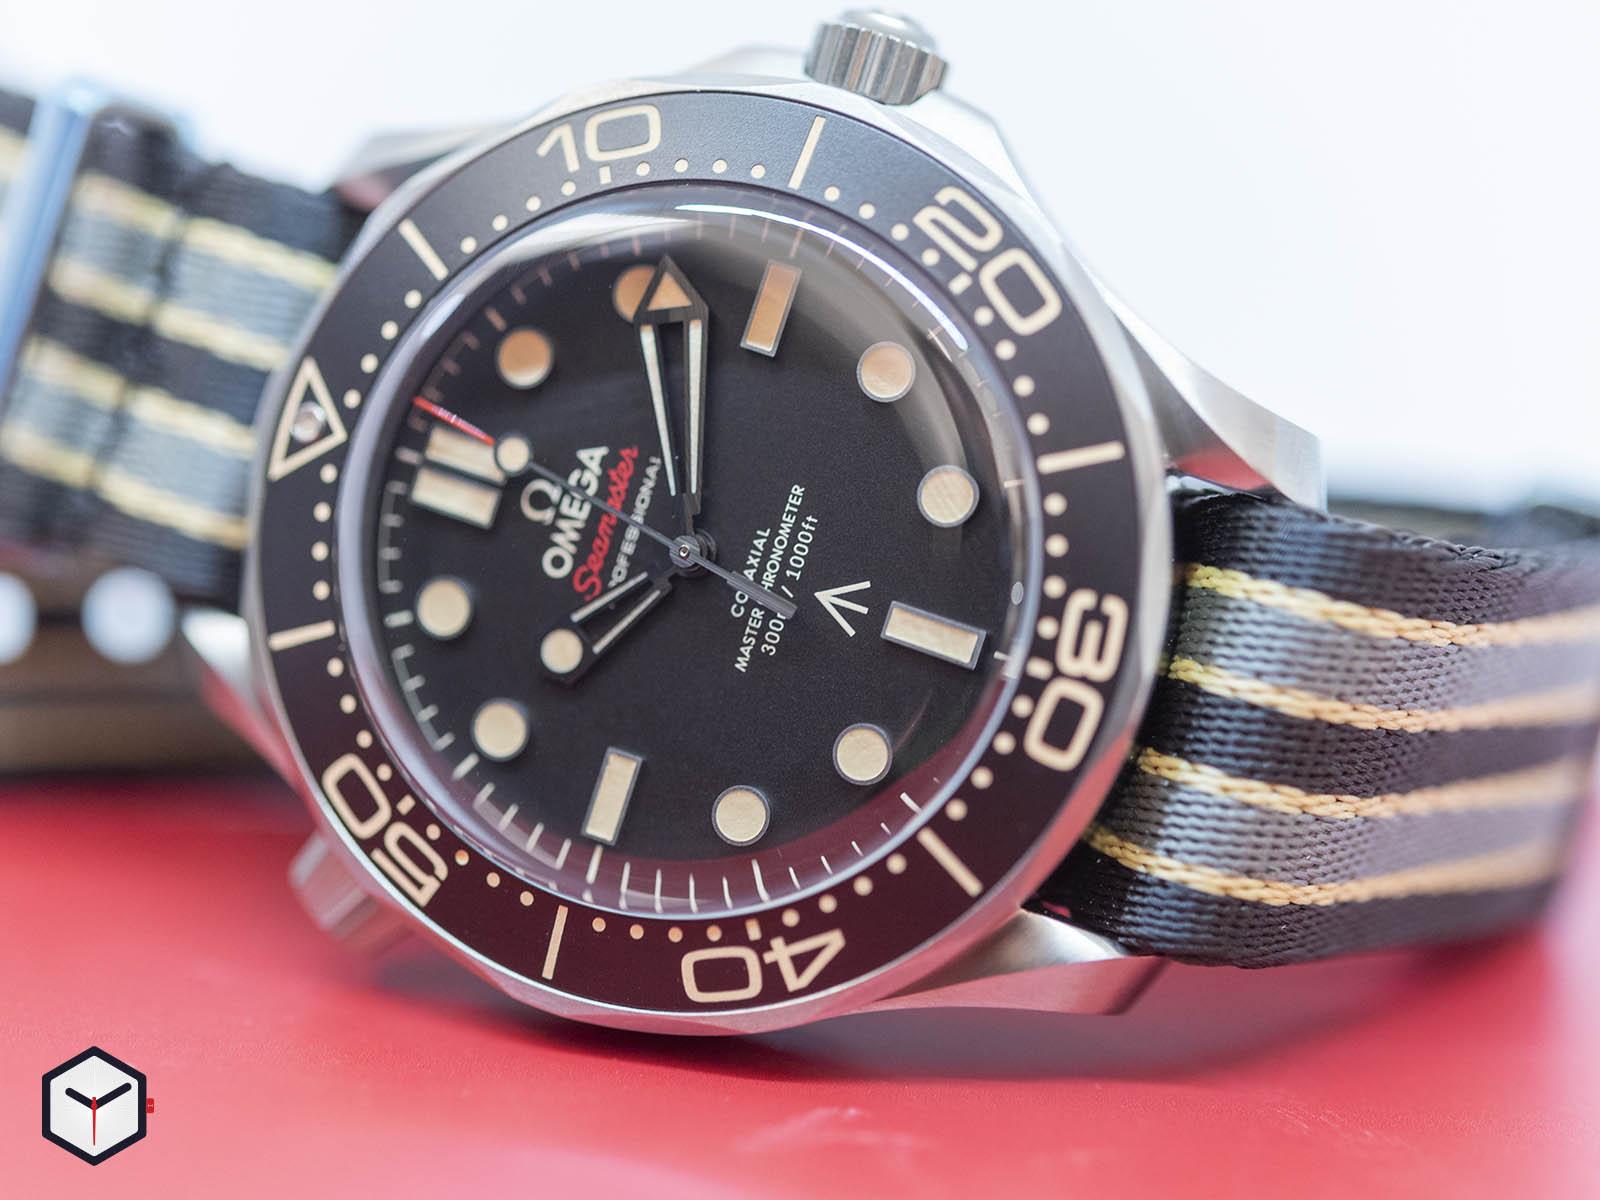 210-92-42-20-01-001-omega-seamaster-diver-300m-007-edition-2-.jpg